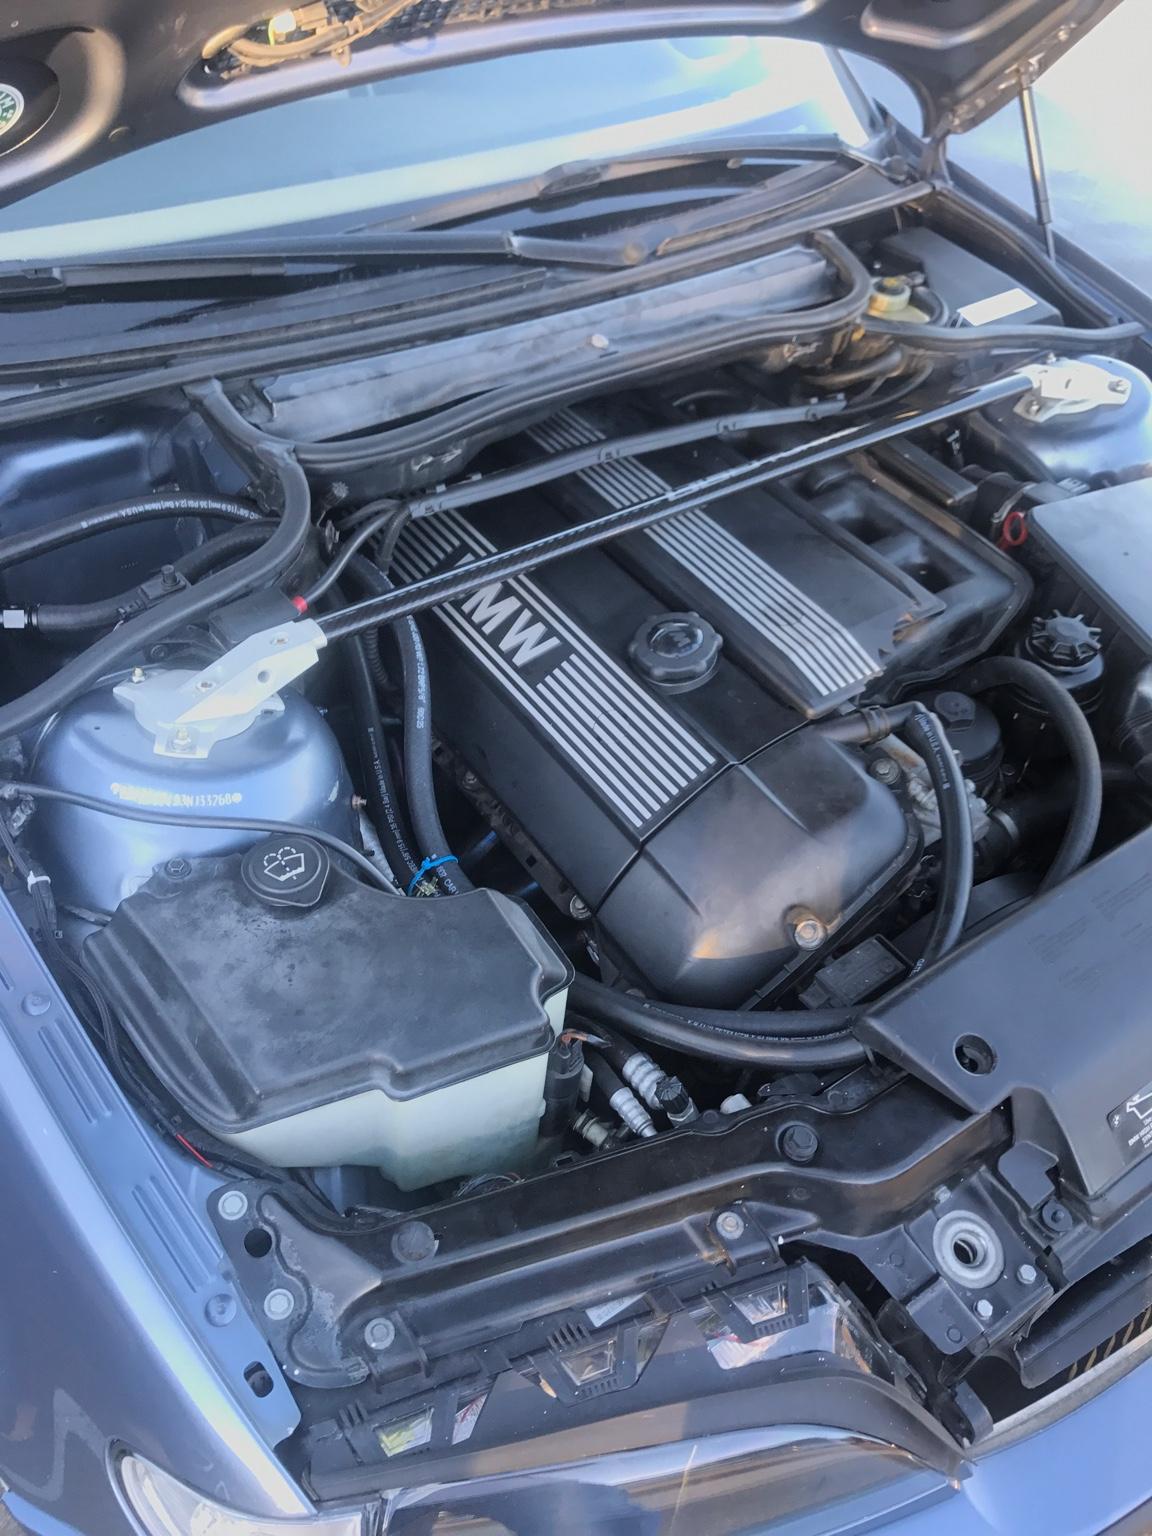 Image Of Ccv Delete Bmw E46 BMW CCV PCV Oil Separator Delete Bypass